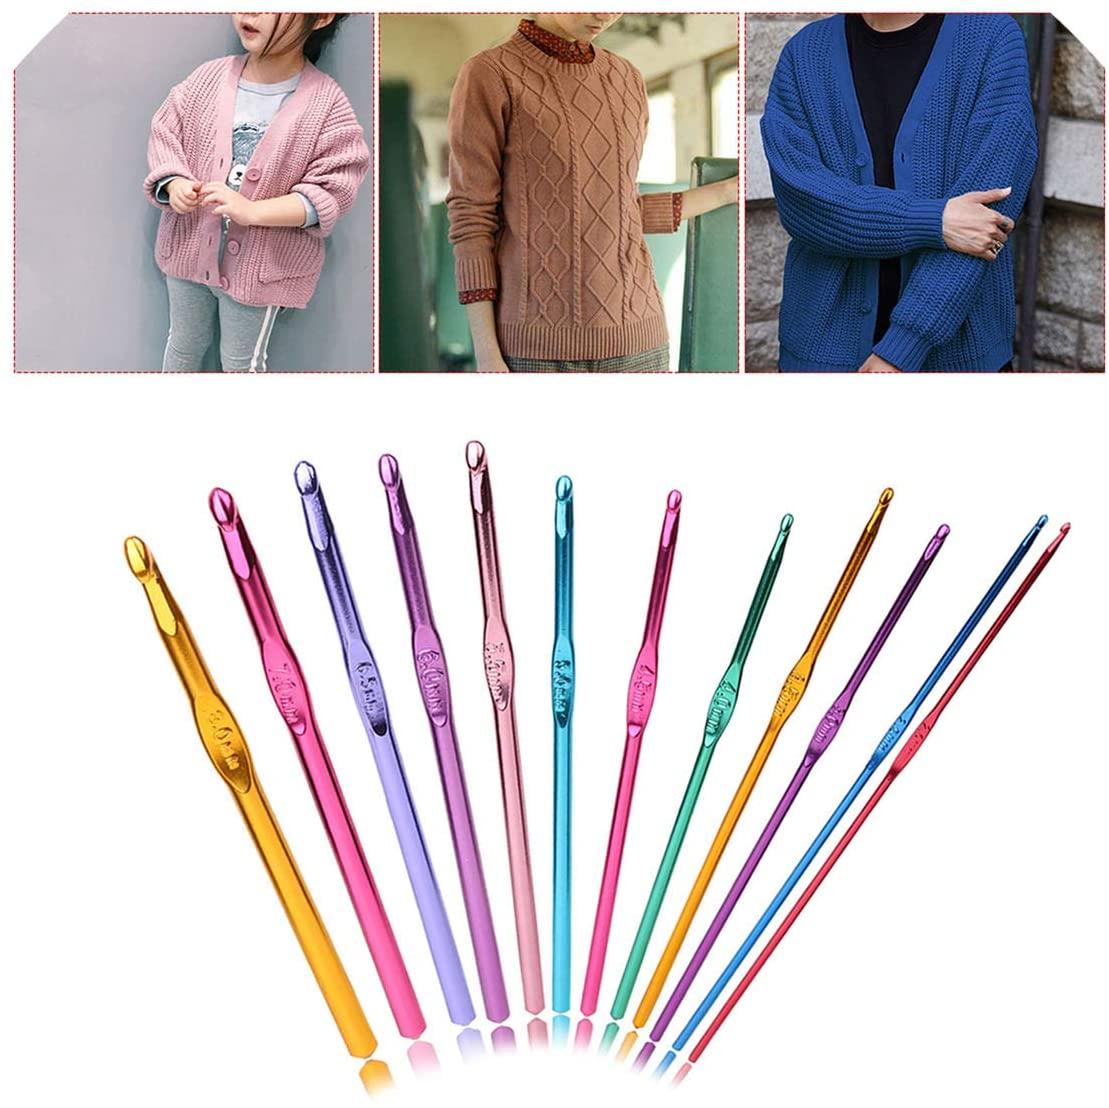 12Pcs/Set Multicolor Aluminium 2Mm 10Mm Crochet Hooks Yarn Knitting Needles Kit Crafts Tools Home Accessories